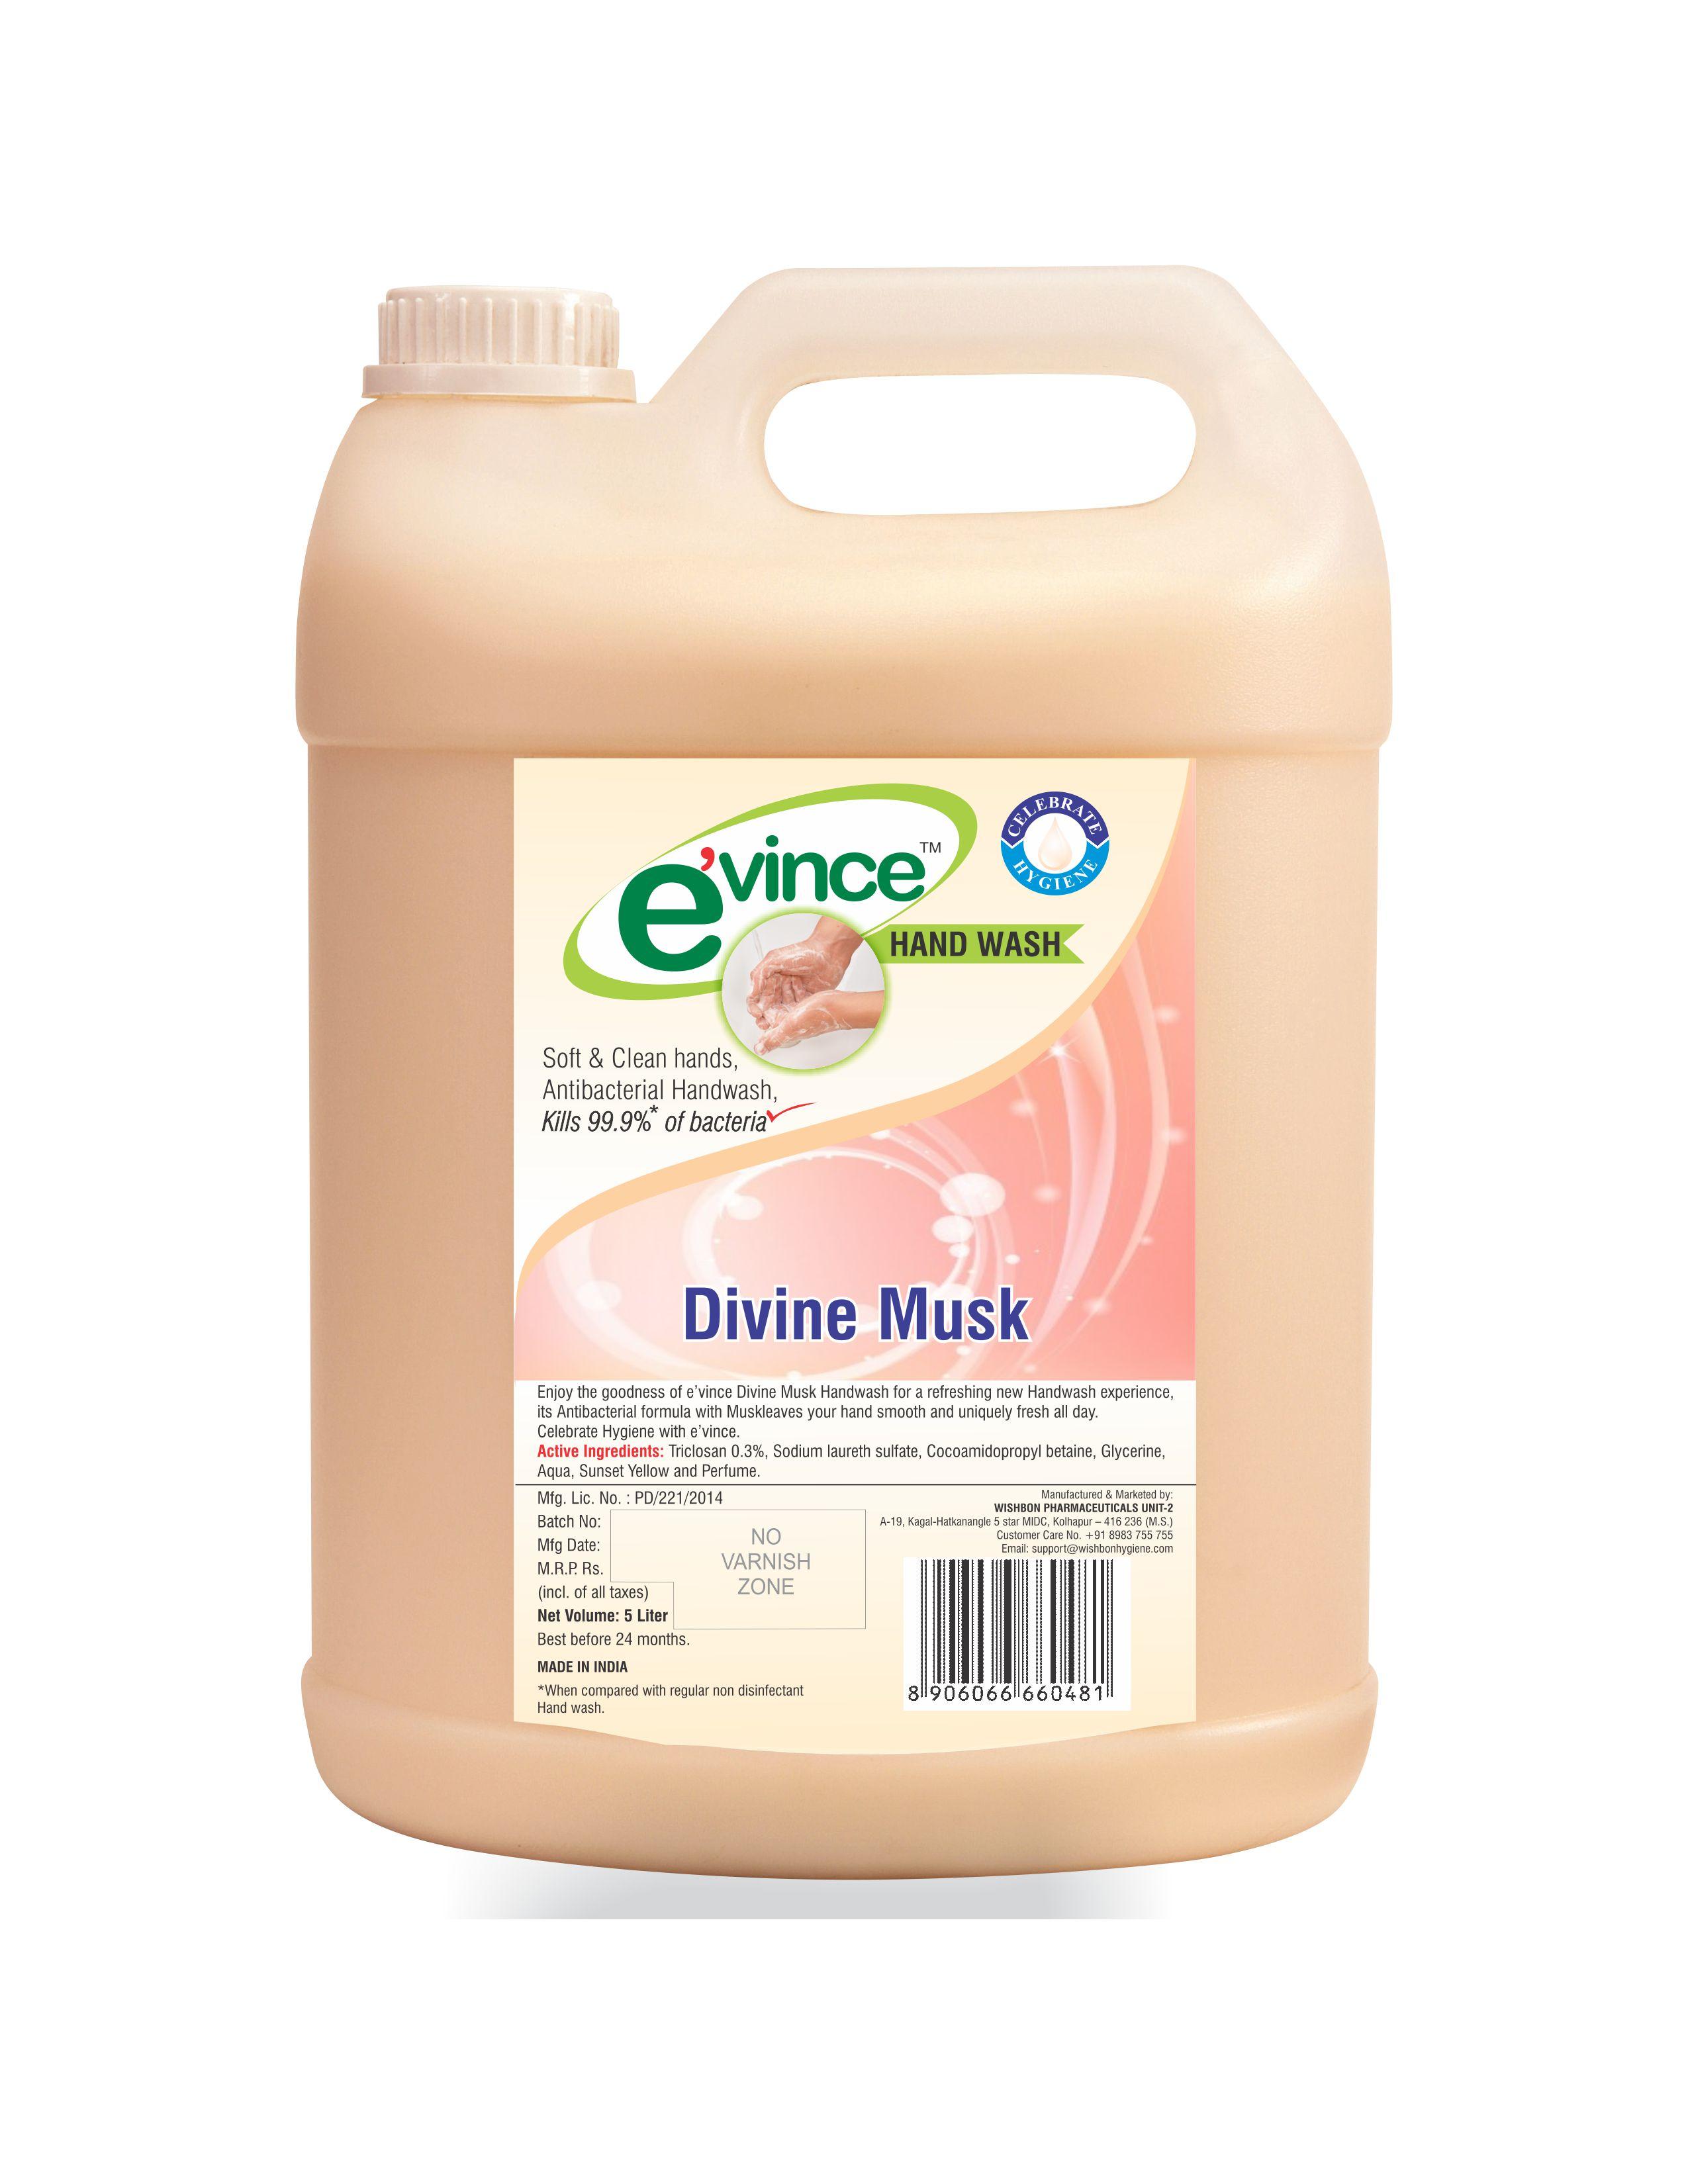 Evince Antibacterial Handwash, 5 Litres  - Divine Musk